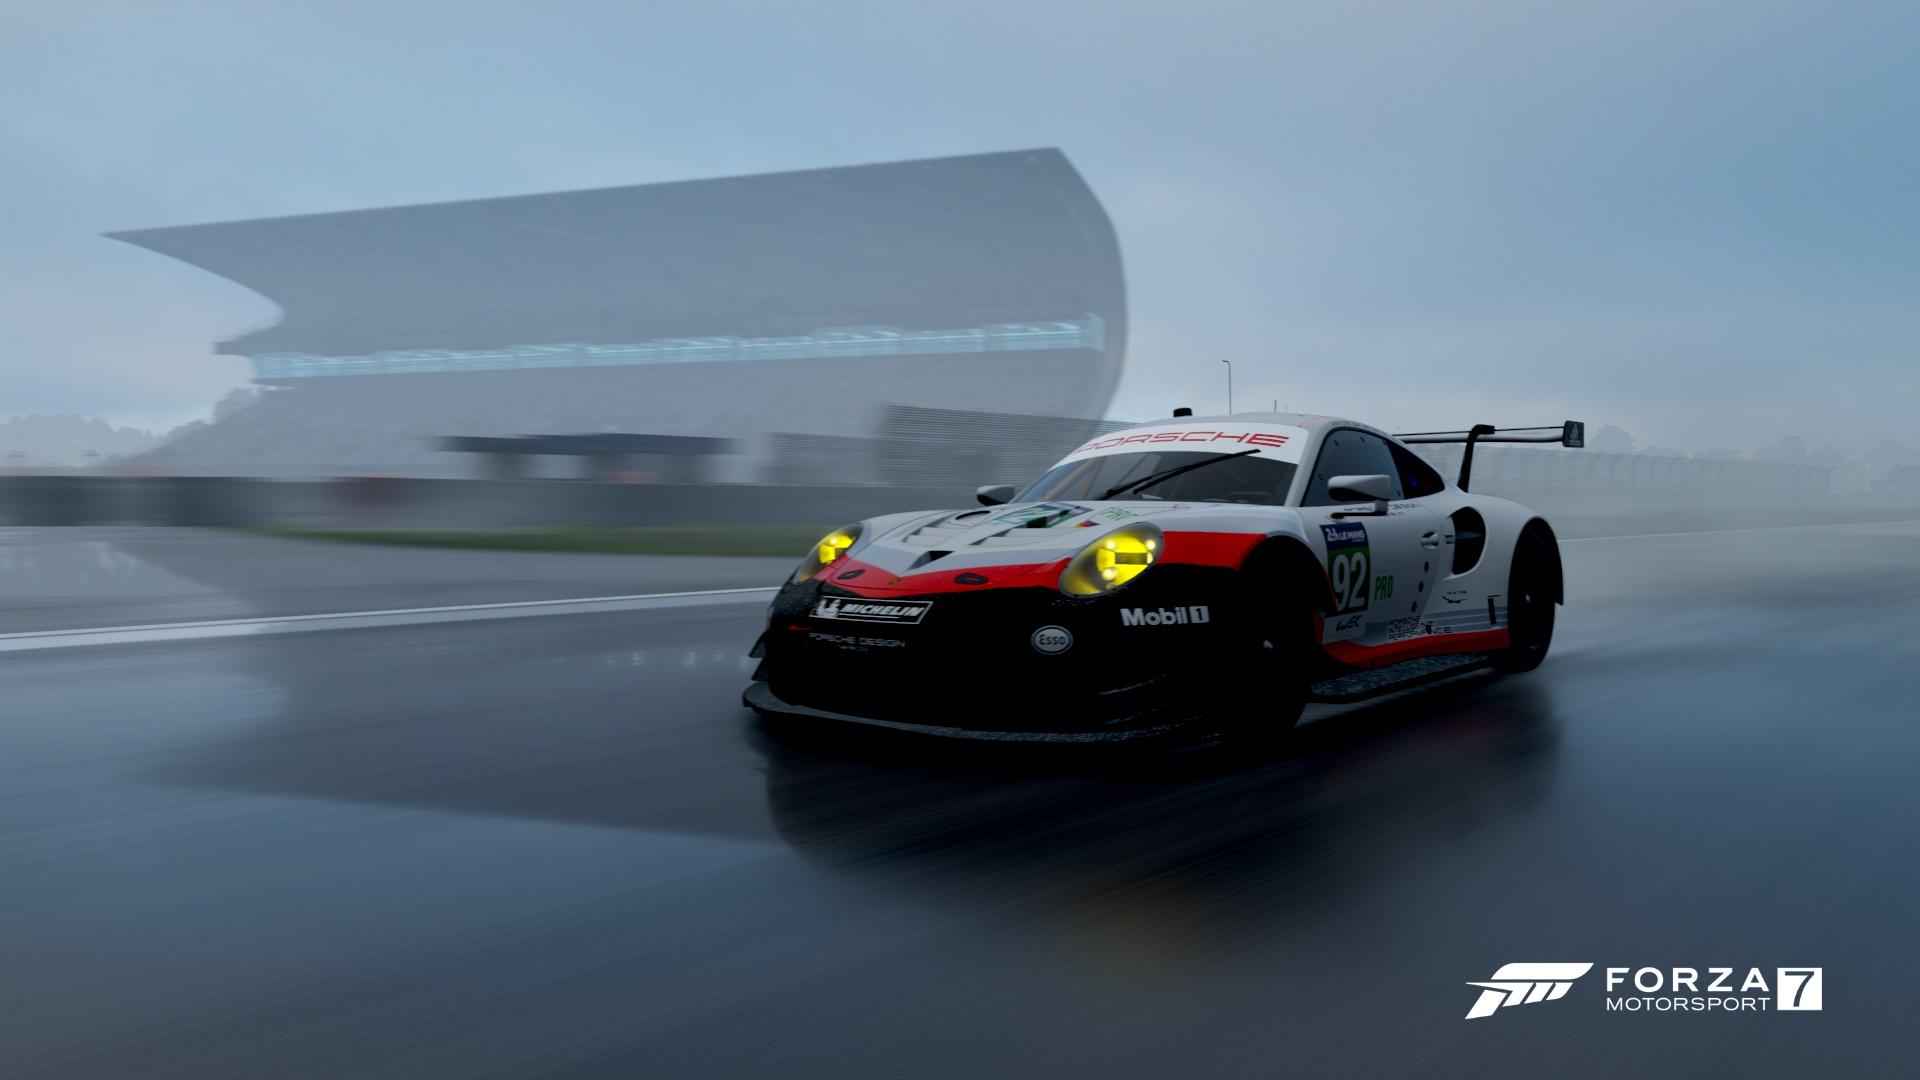 Forza Porsche Car Forza Motorsport Forza Motorsport 7 Wallpaper Resolution 1920x1080 Id 656180 Wallha Com